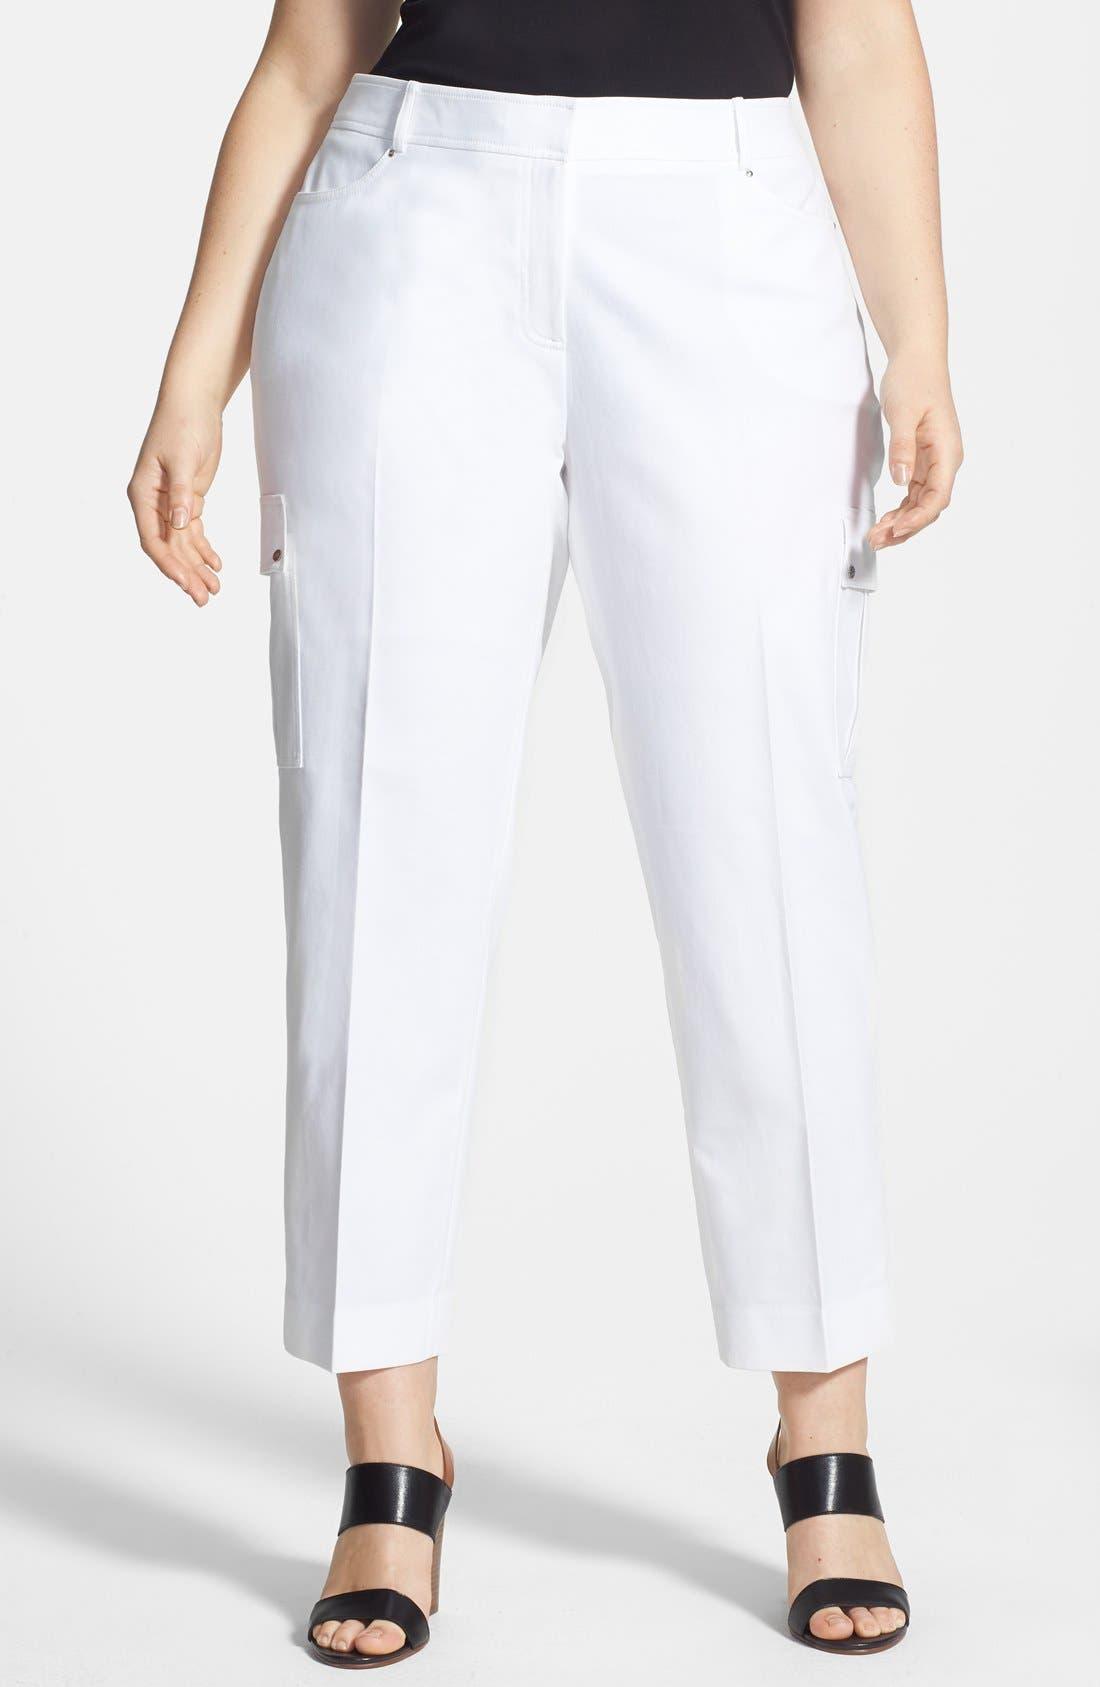 Alternate Image 1 Selected - Anne Klein Cargo Capri Pants (Plus Size)